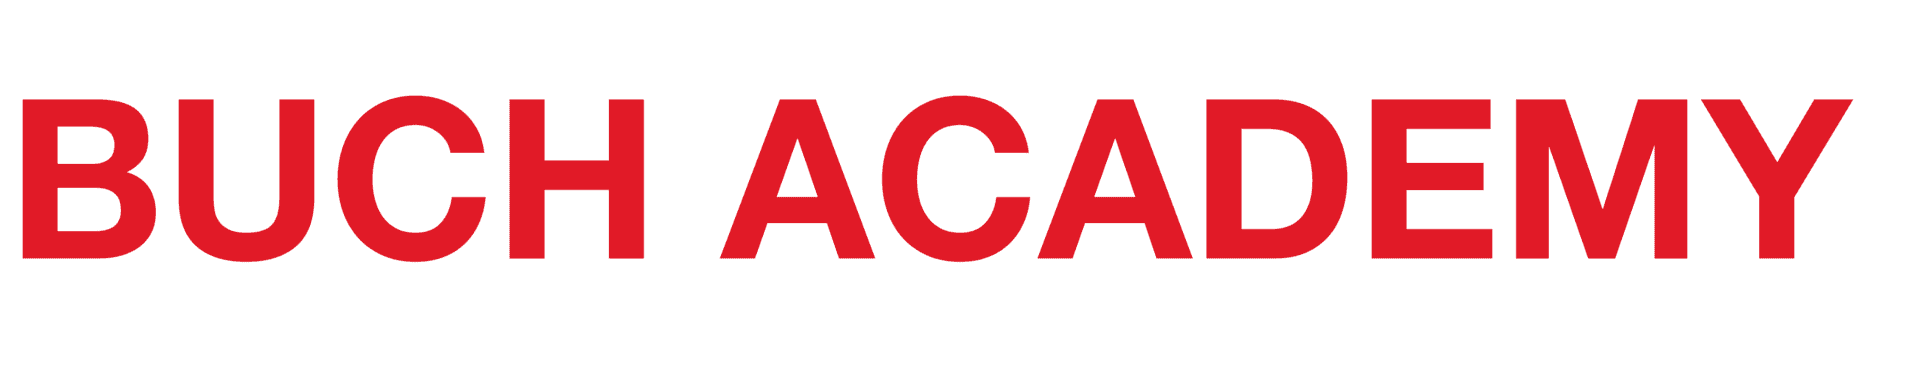 SWISS ACADEMY SACT AG